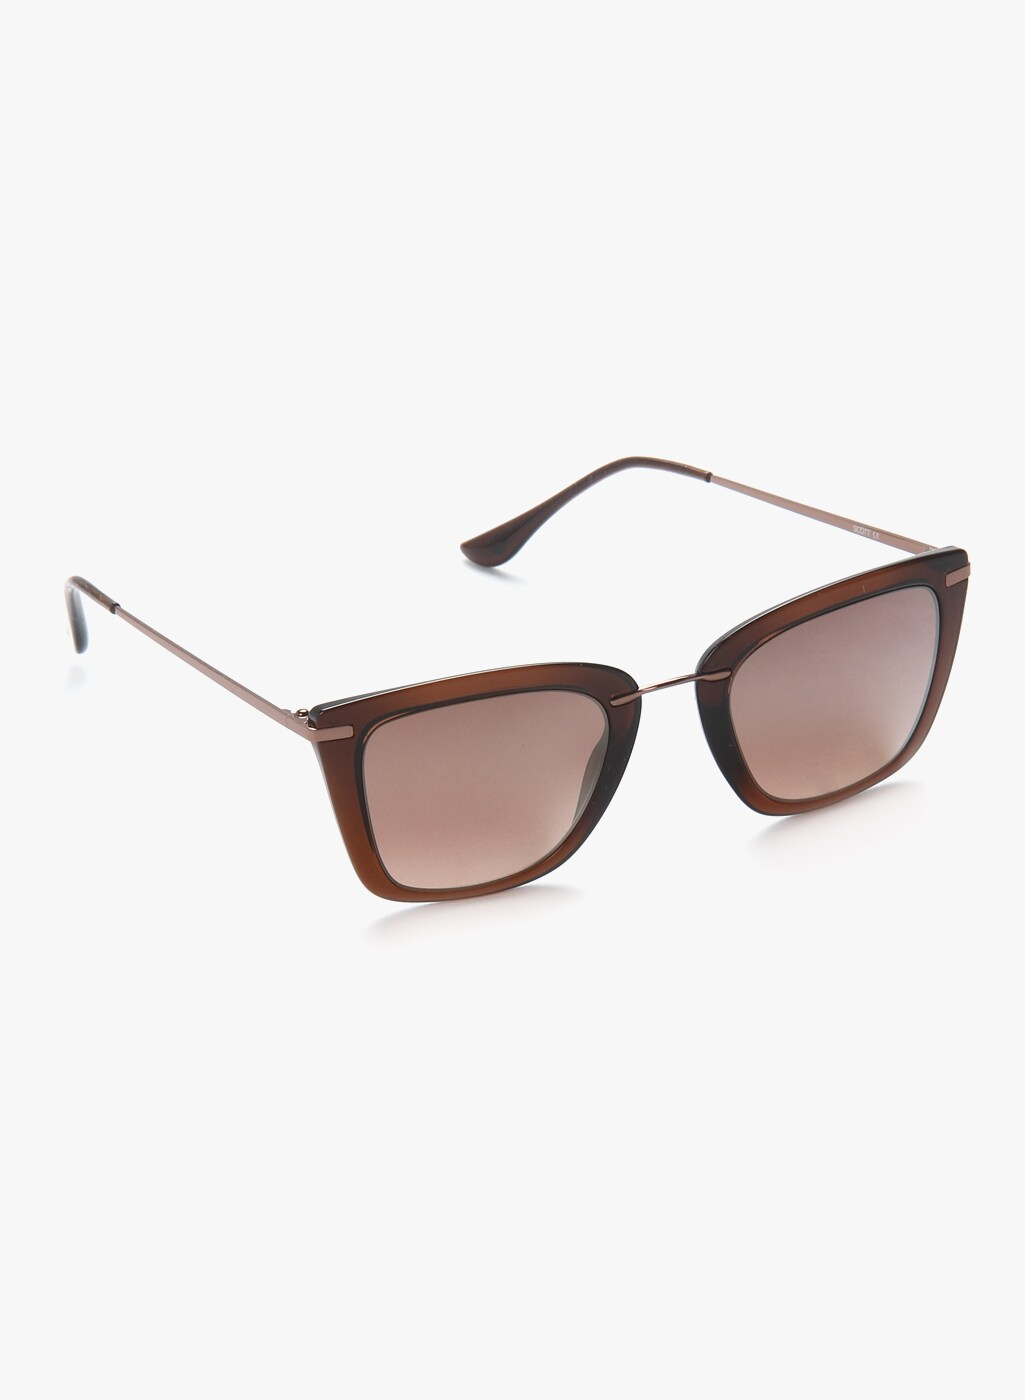 0836b71c88e36 Barbara Cat Eye Sunglasses Brown - Buy Barbara Cat Eye Sunglasses Brown  online in India